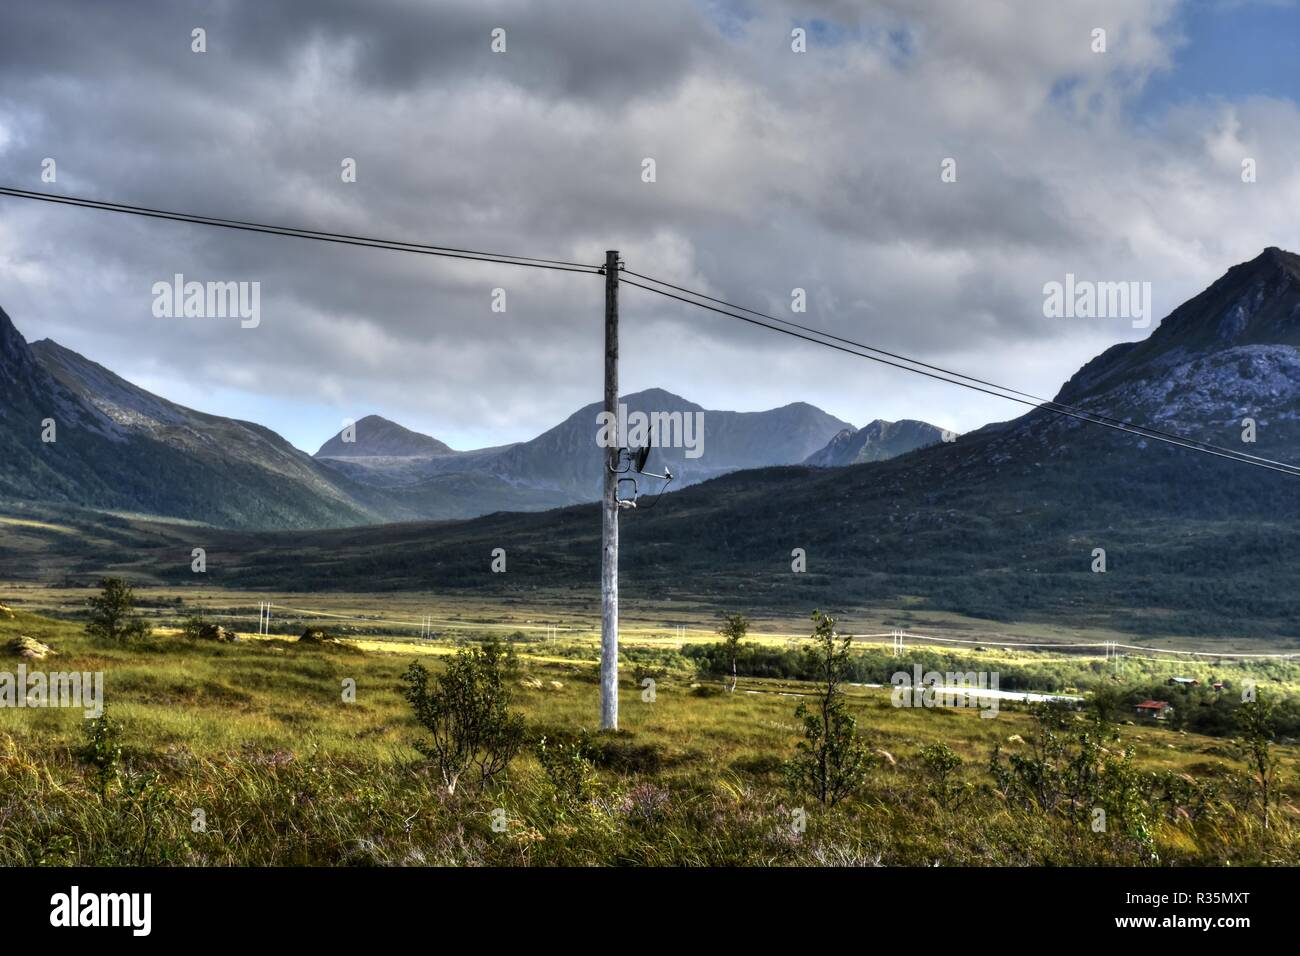 Küste, Lofoten, Norwegen, Satellitenantenne, Schüssel, Spiegel, Antenne, Höhe, Azimut, LNB, LNC, Empfang, Lenting, Fjord, Leitung, Stockbild